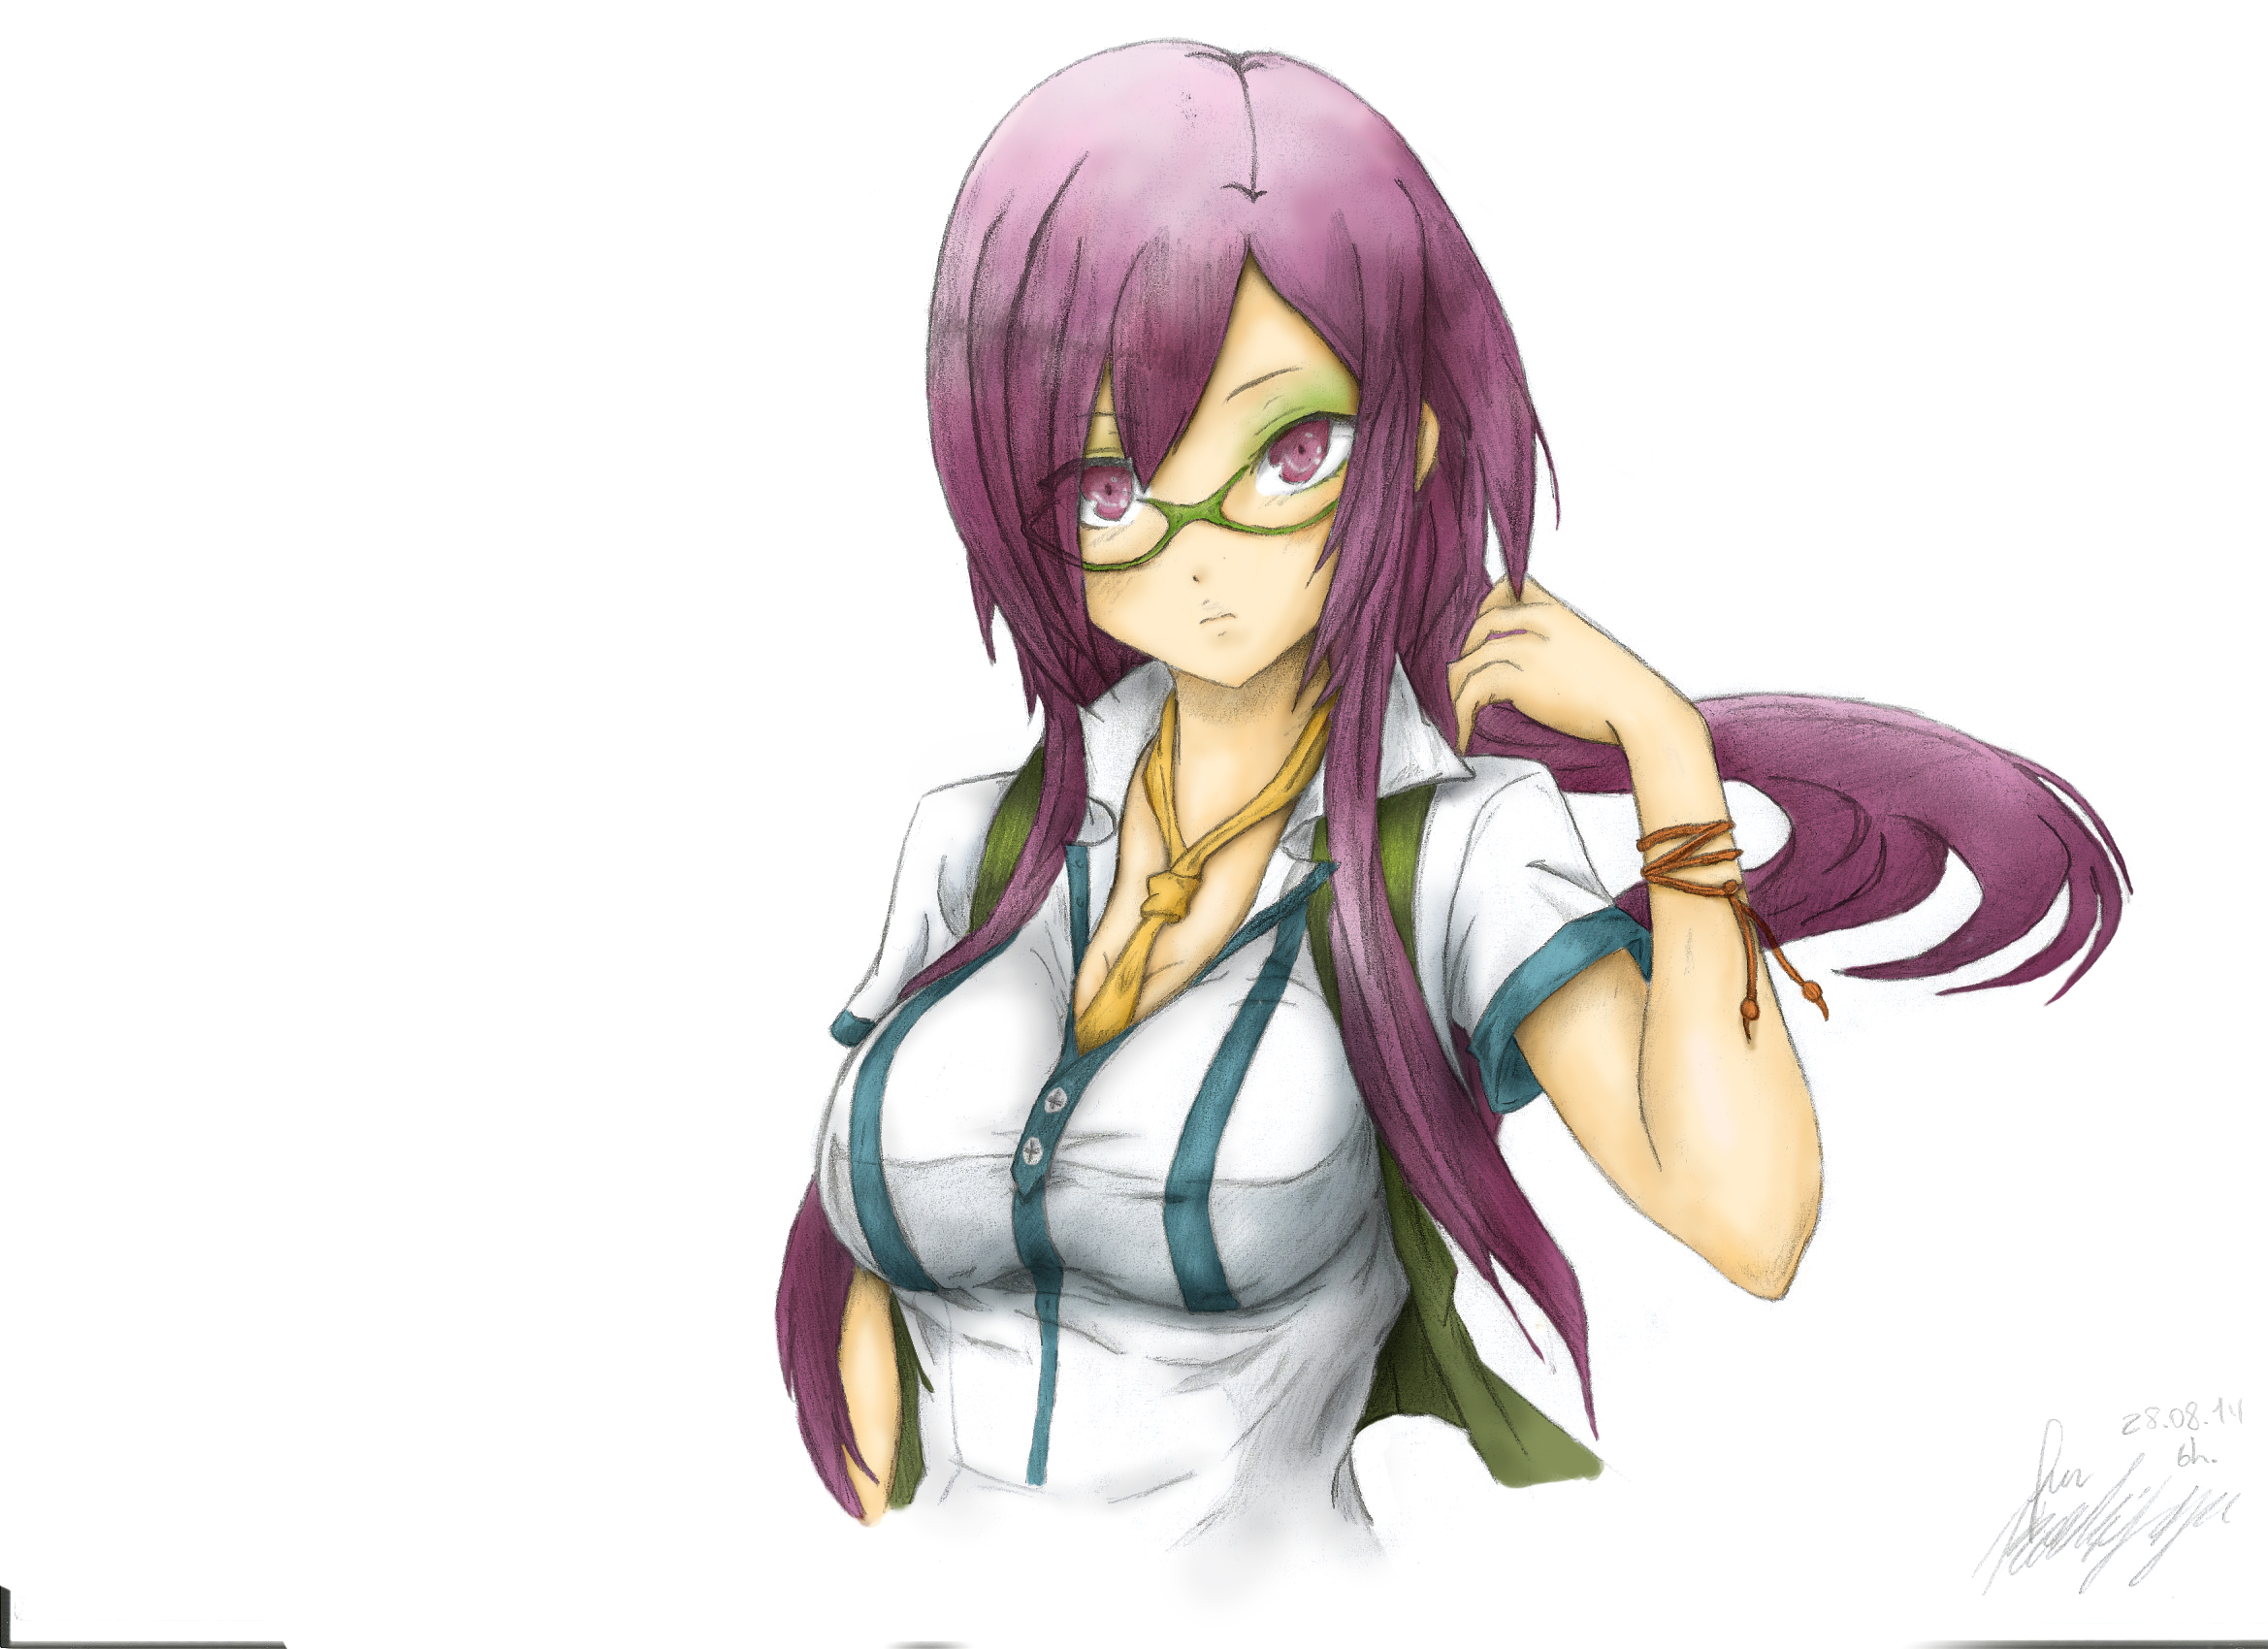 Hot Purple-haired teacher :)